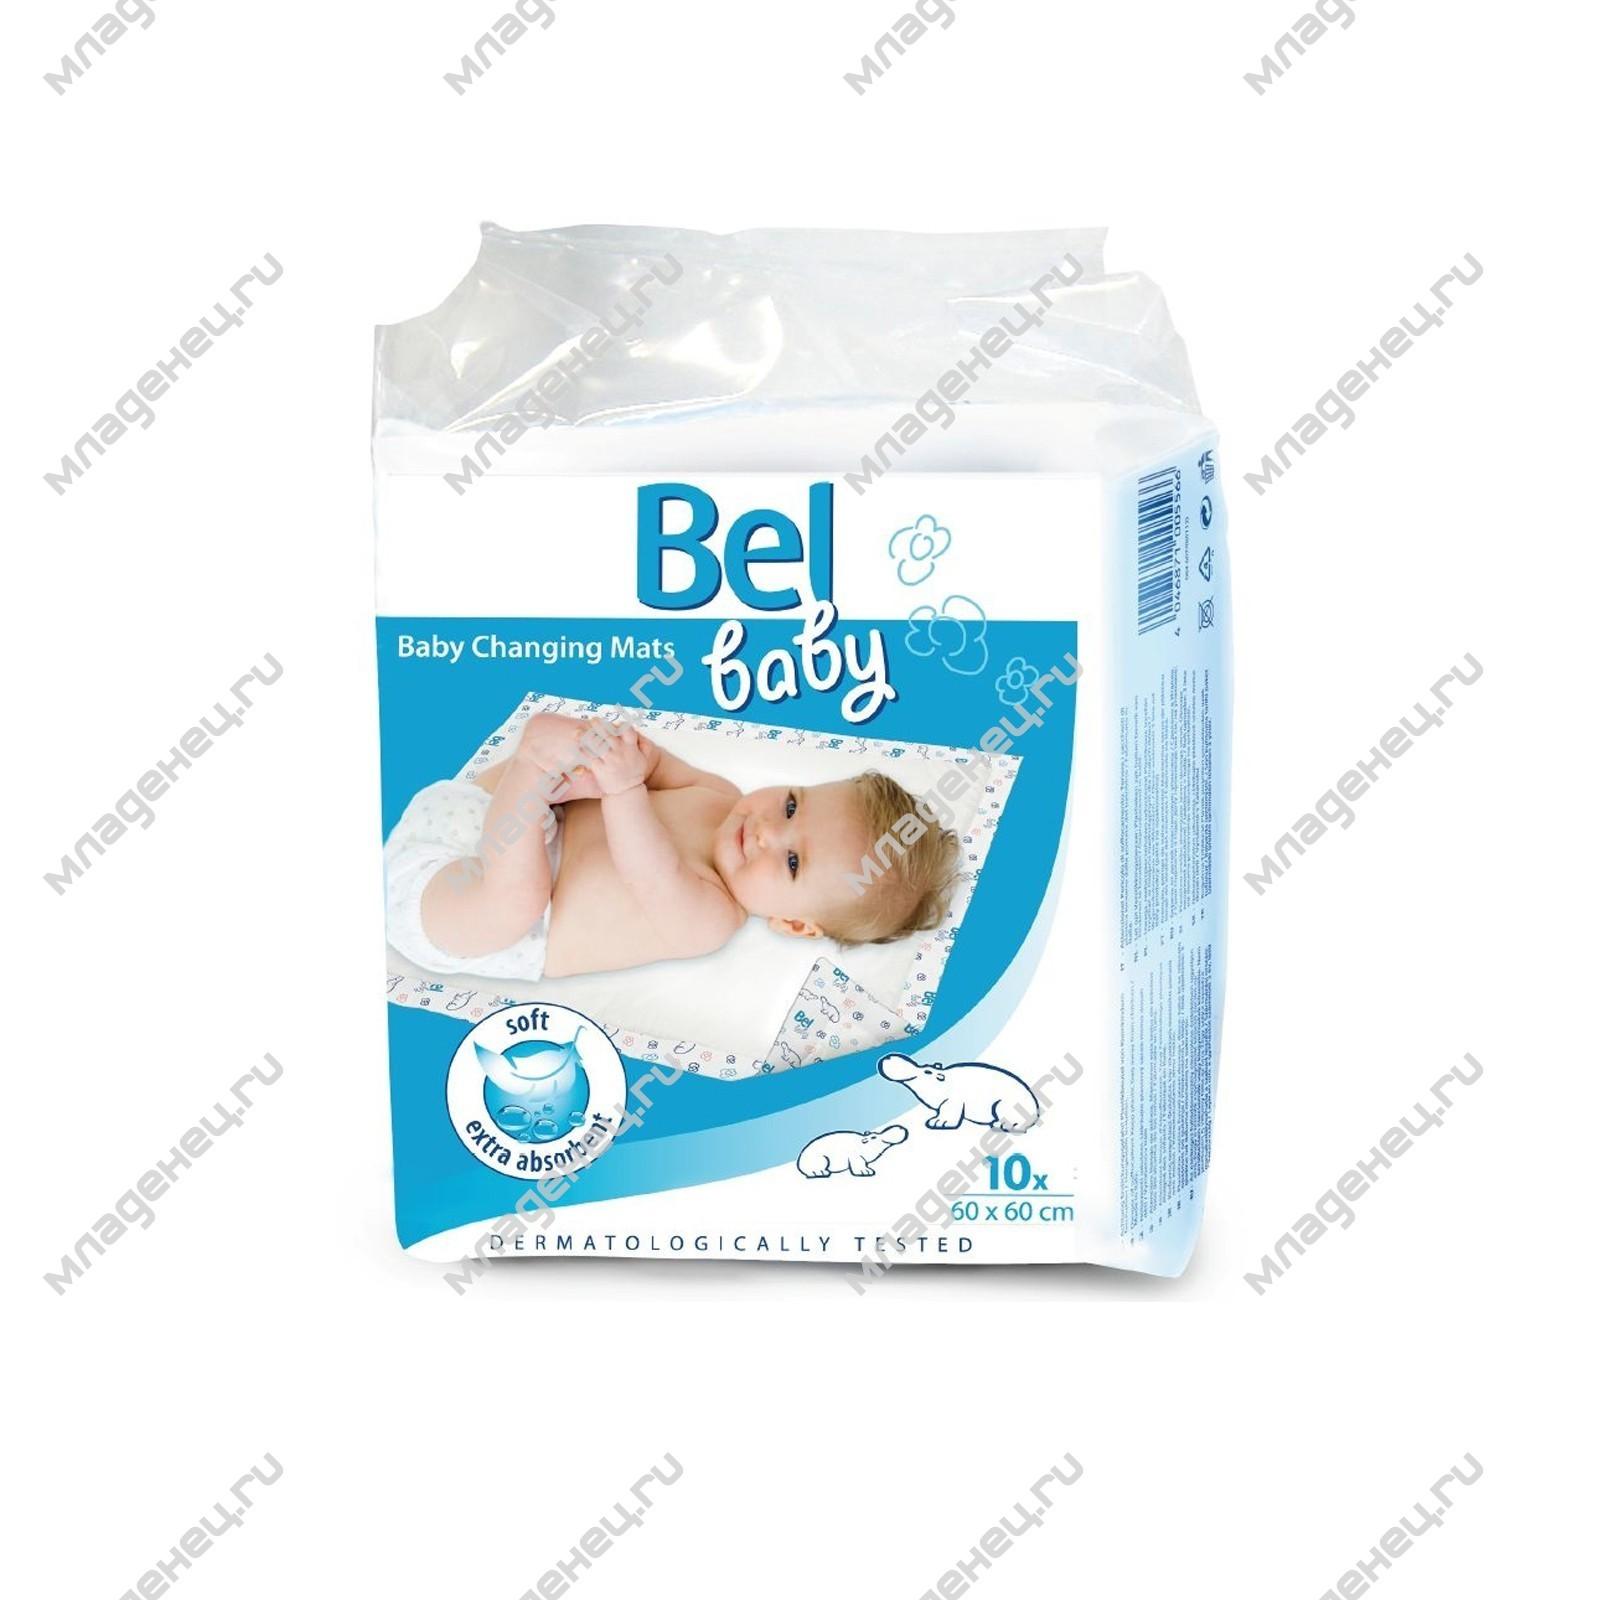 Пеленки Hartmann Bel Baby Changing Mats 60х60 см (10 шт)<br>